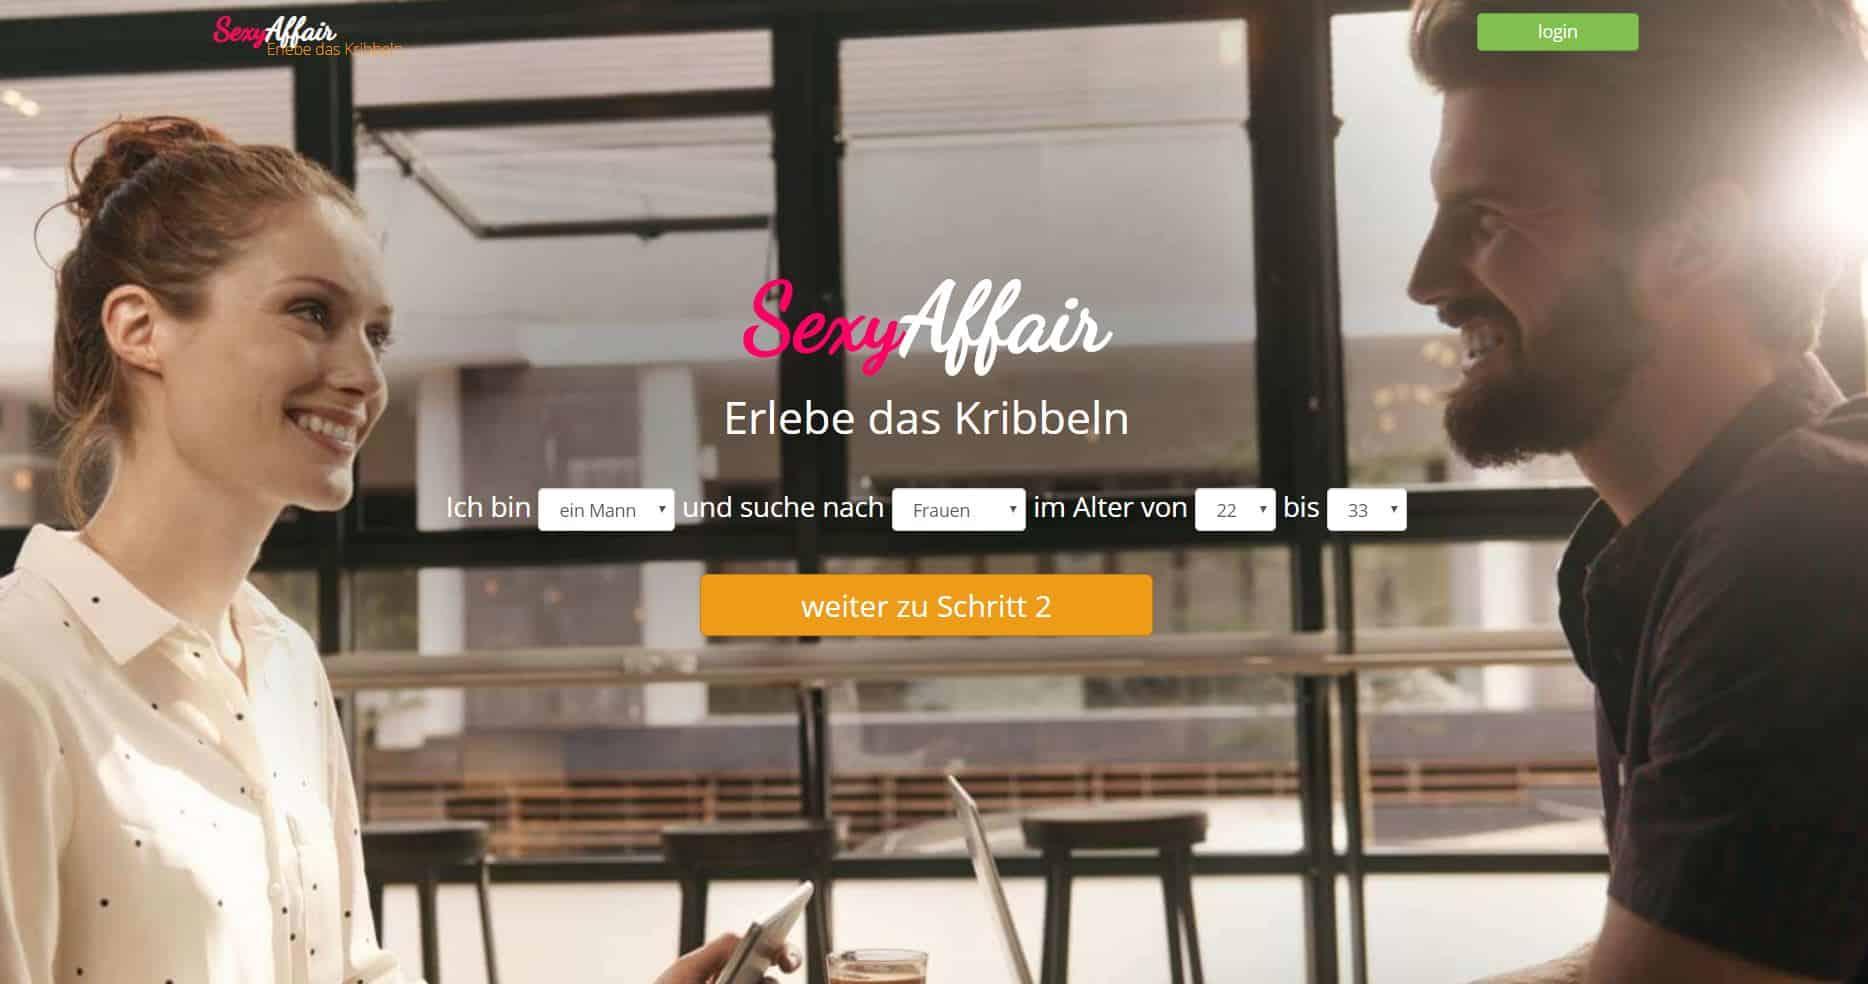 Testbericht: Sexy-Affair.eu Abzocke